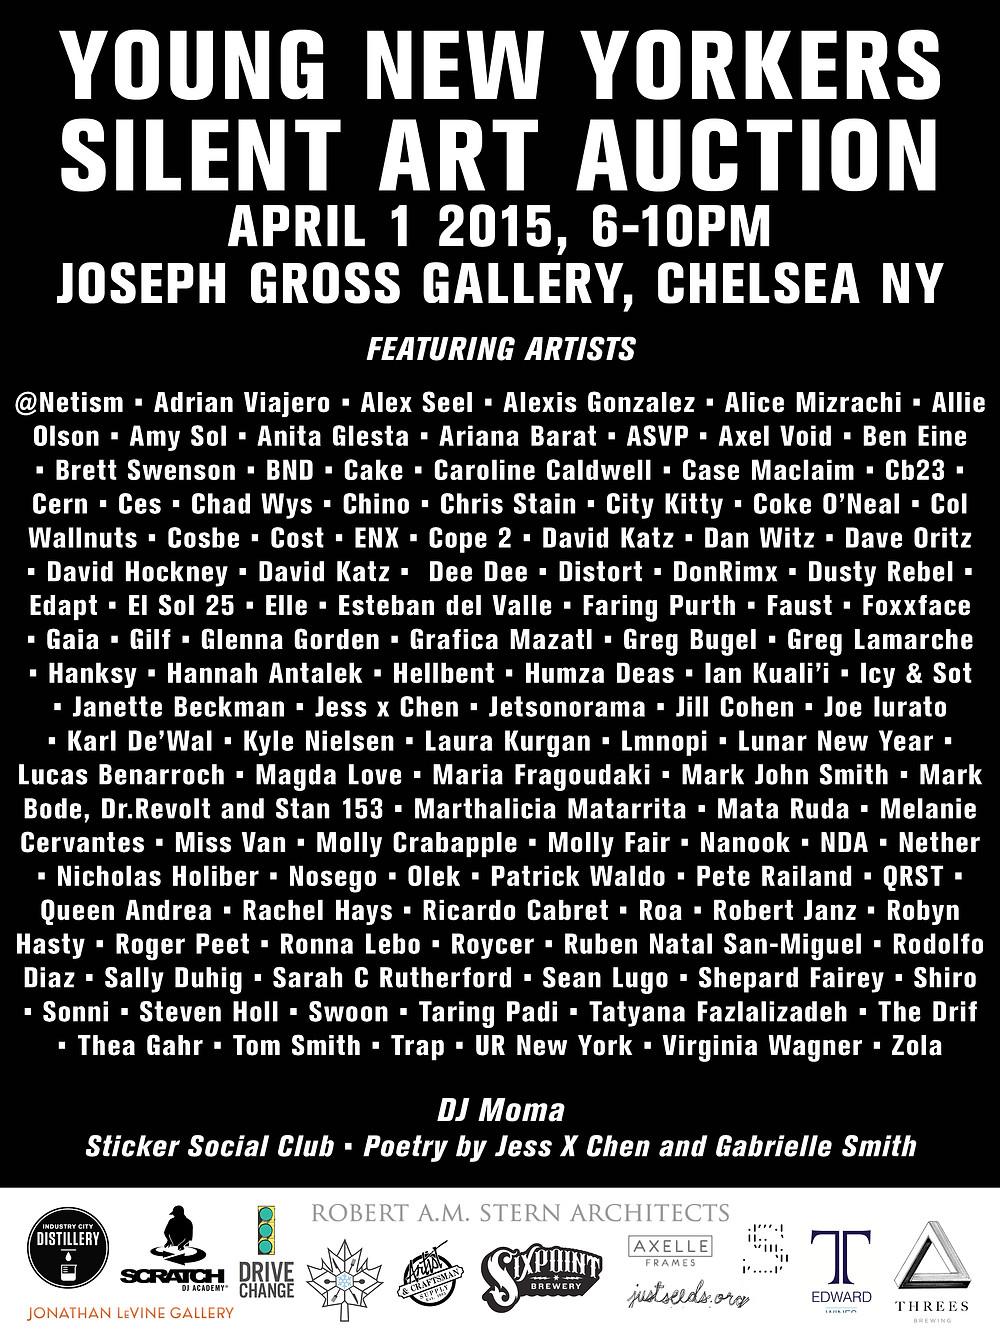 YNY 2015 AUCTION POSTER - ROUND 14 (1).jpg